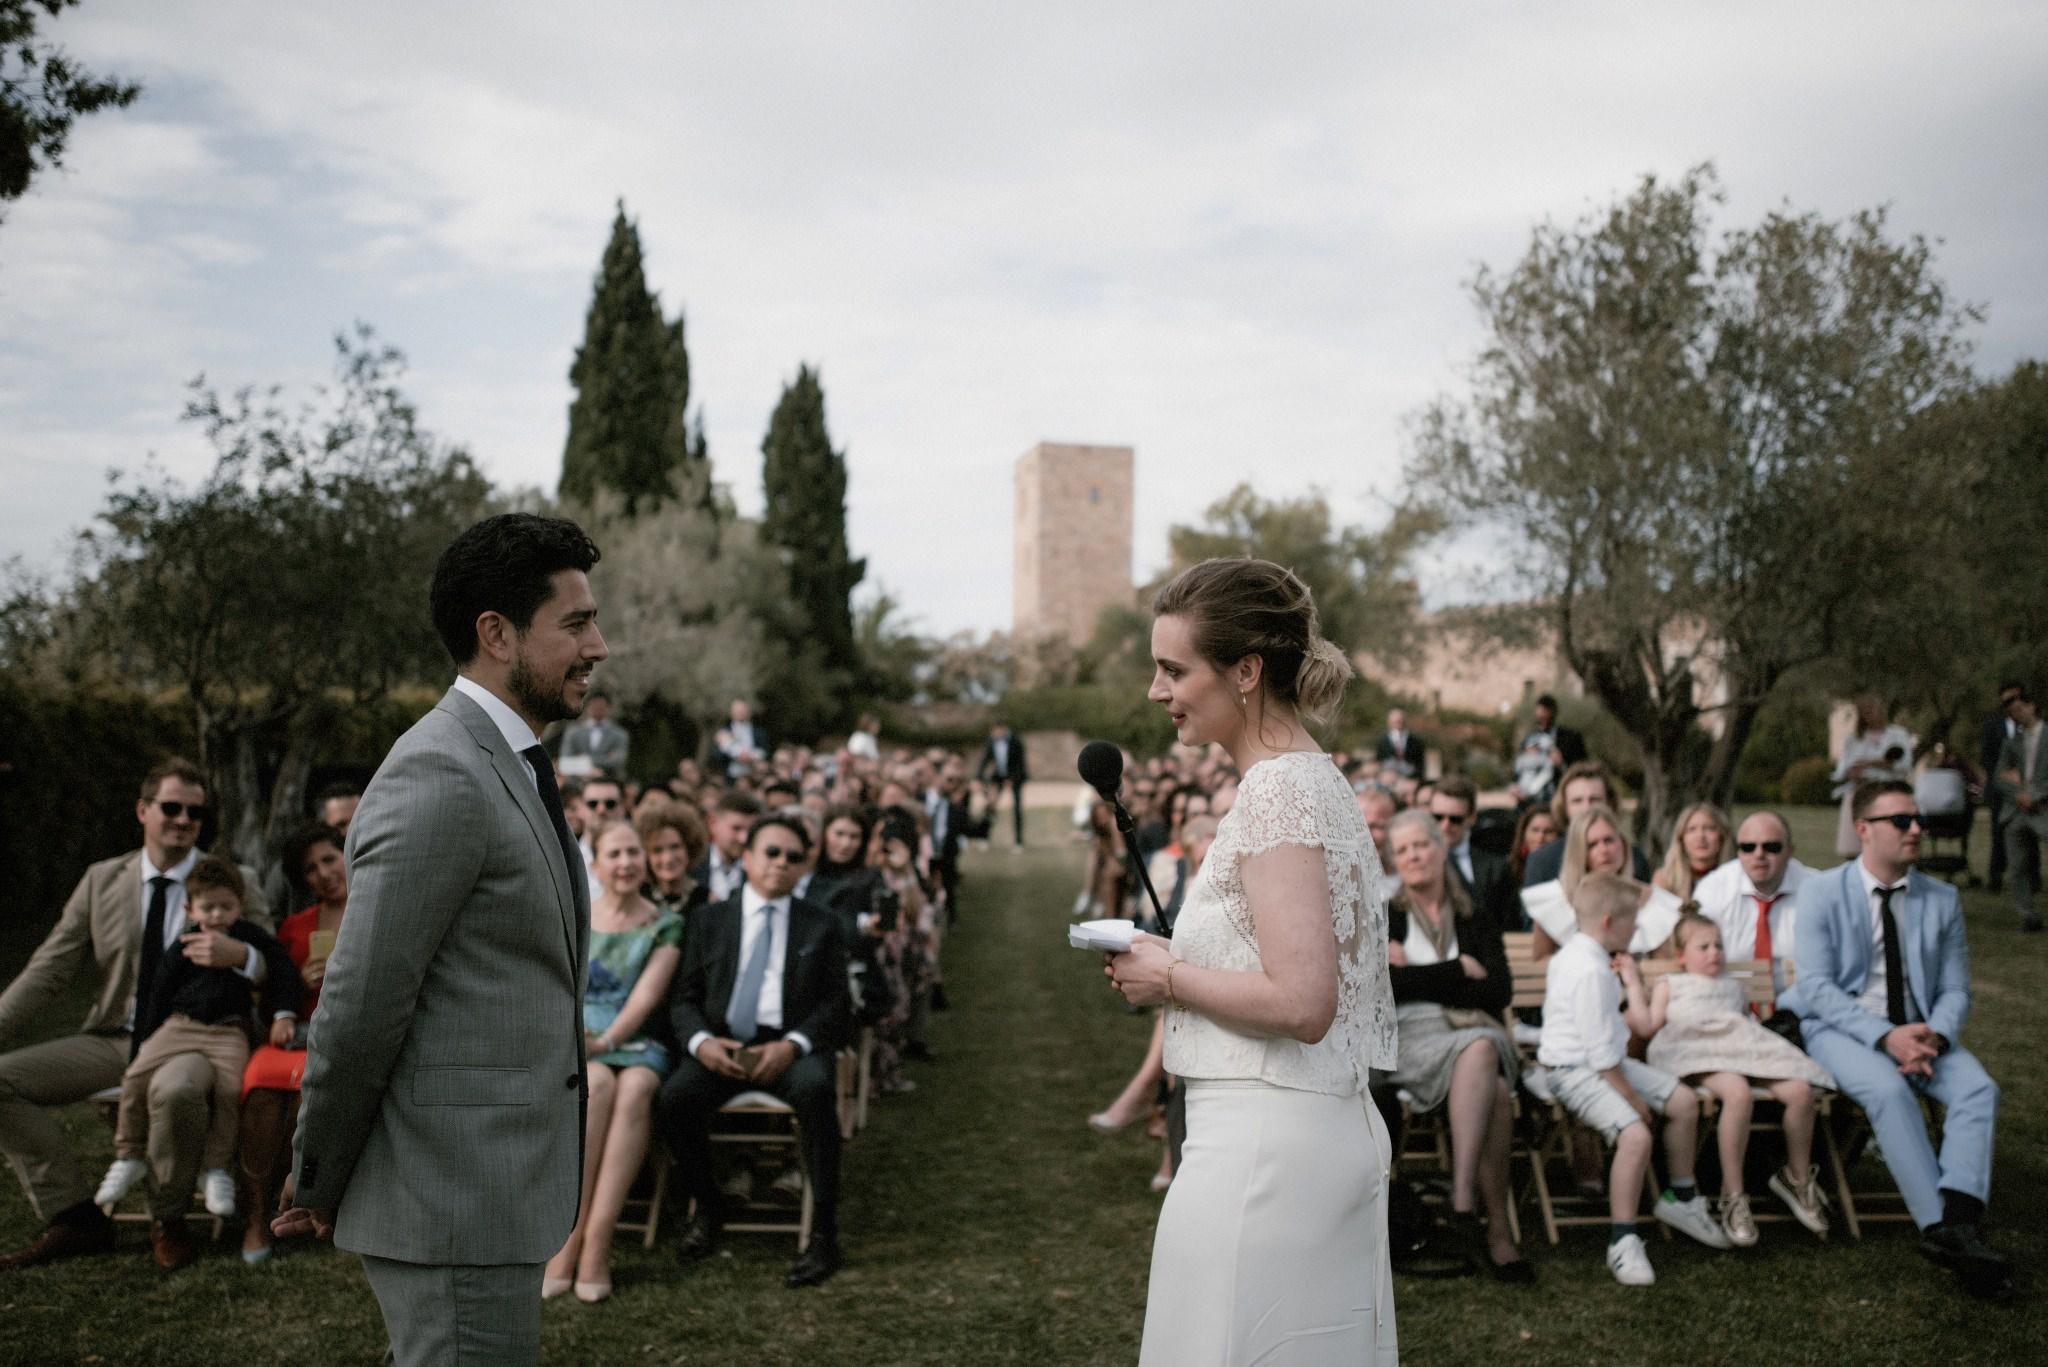 Bruidsfotograaf Spanje Castle d'Emporda destination wedding Naomi van der Kraan00039.jpg